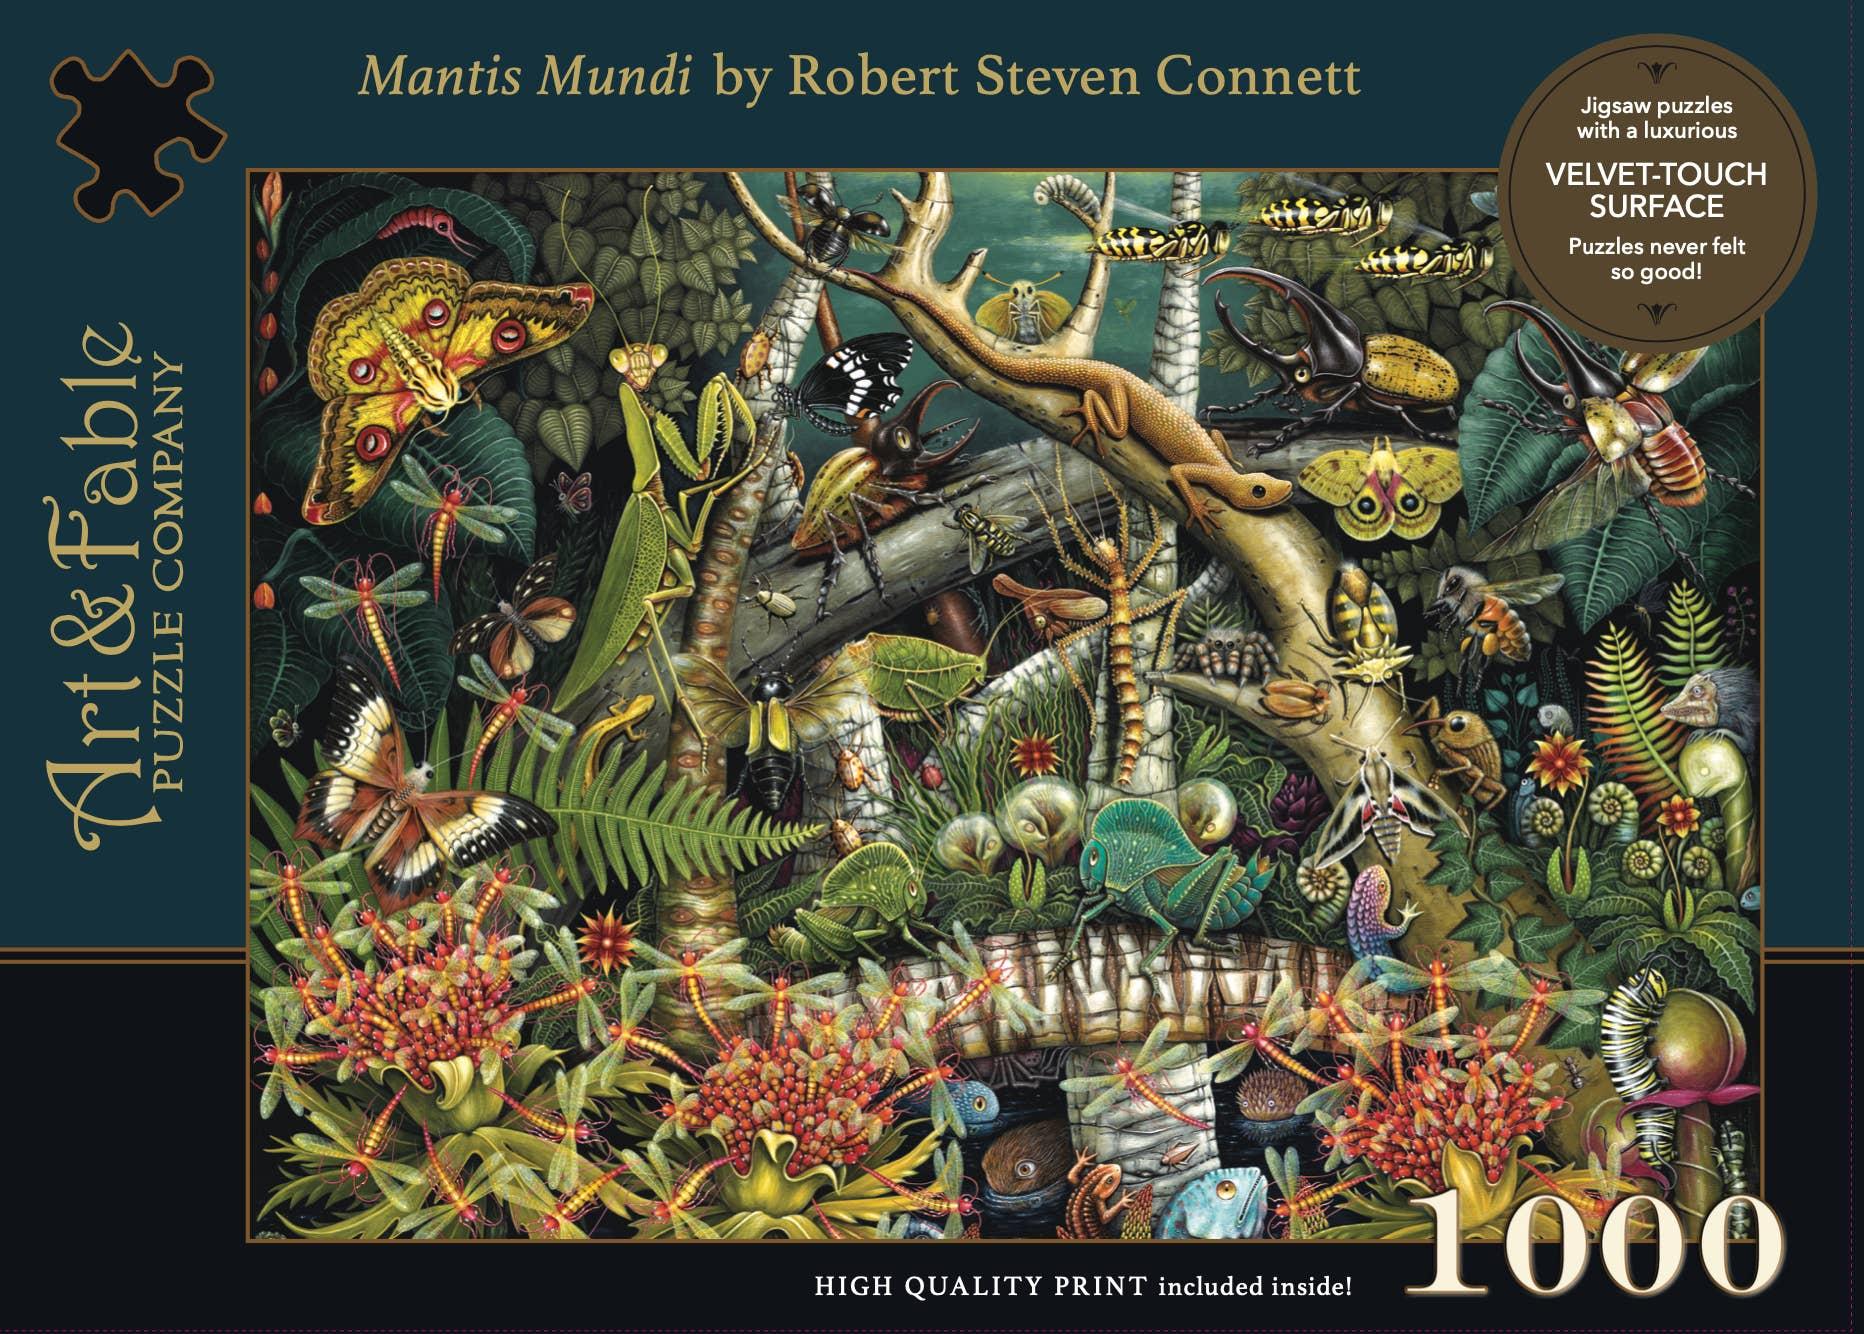 Mantis Mundi, 1000-pc Velvet-Touch Jigsaw Puzzle by artist RS Connett | Trada Marketplace